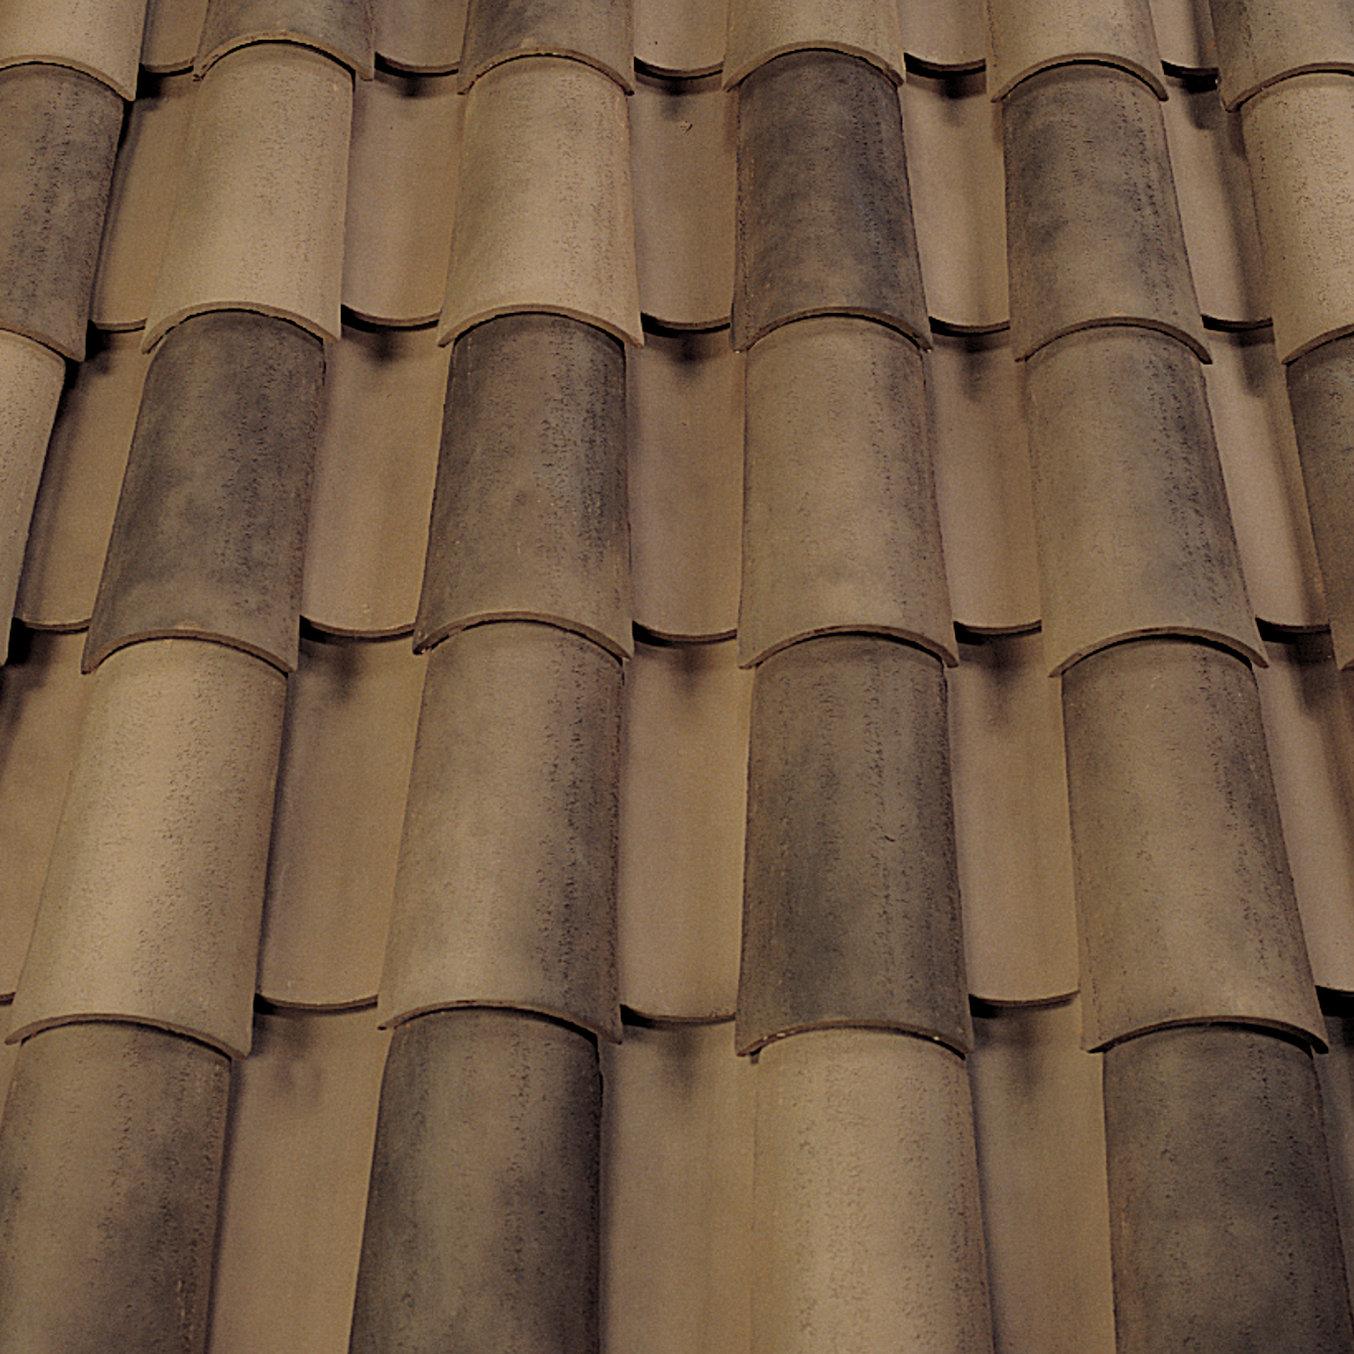 MCA Clay Roof Tile, Maruhachi Ceramics of America, Inc. (MCA) image | MCA Clay Roof Tile, Maruhachi Ceramics of America, Inc. (MCA)